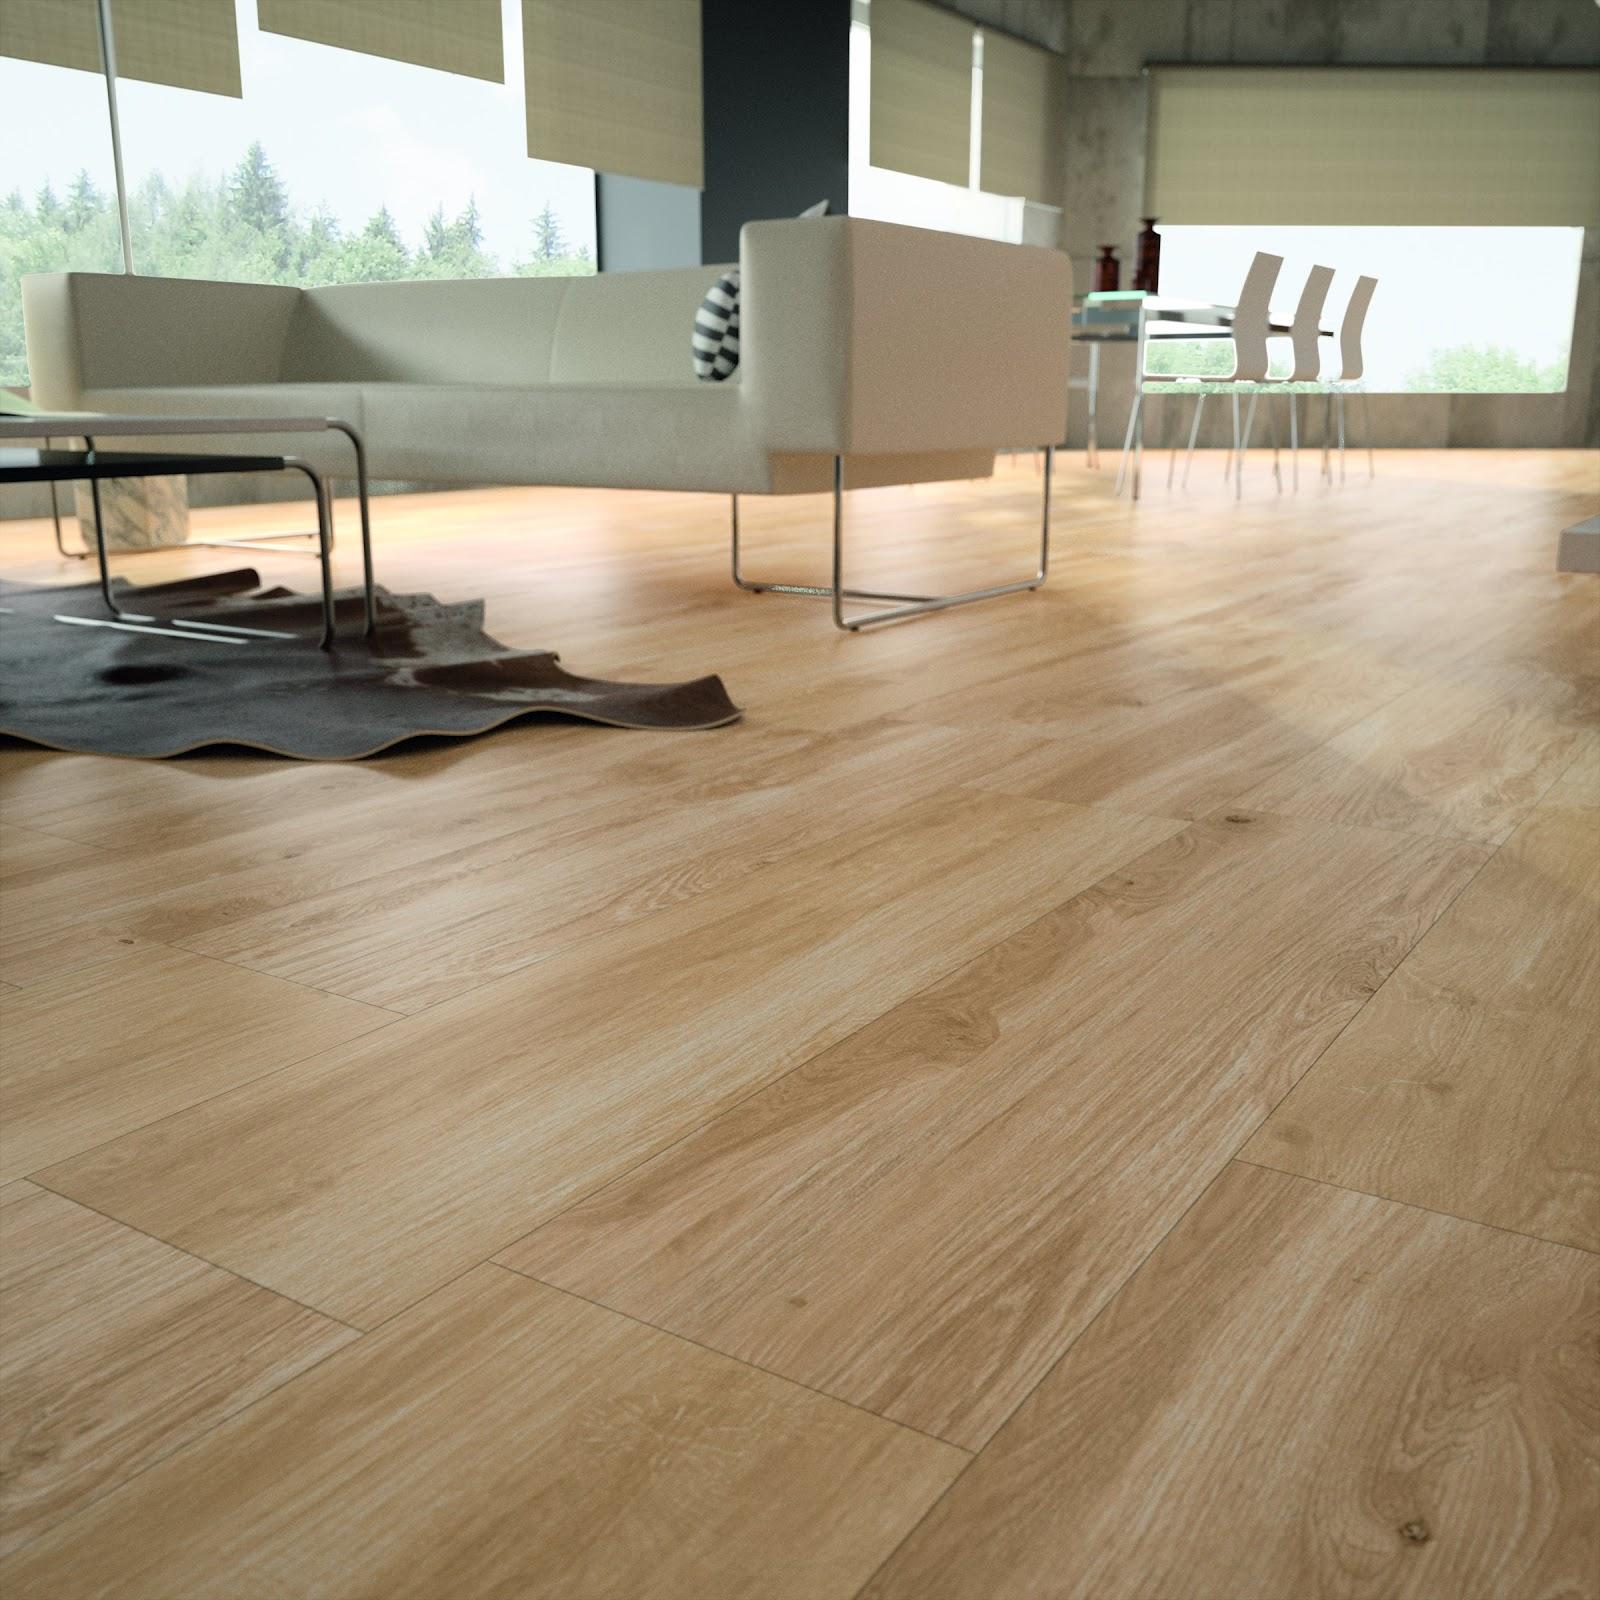 Decoracional c mo instalar cer mica imitaci n madera for Tipos suelos de madera